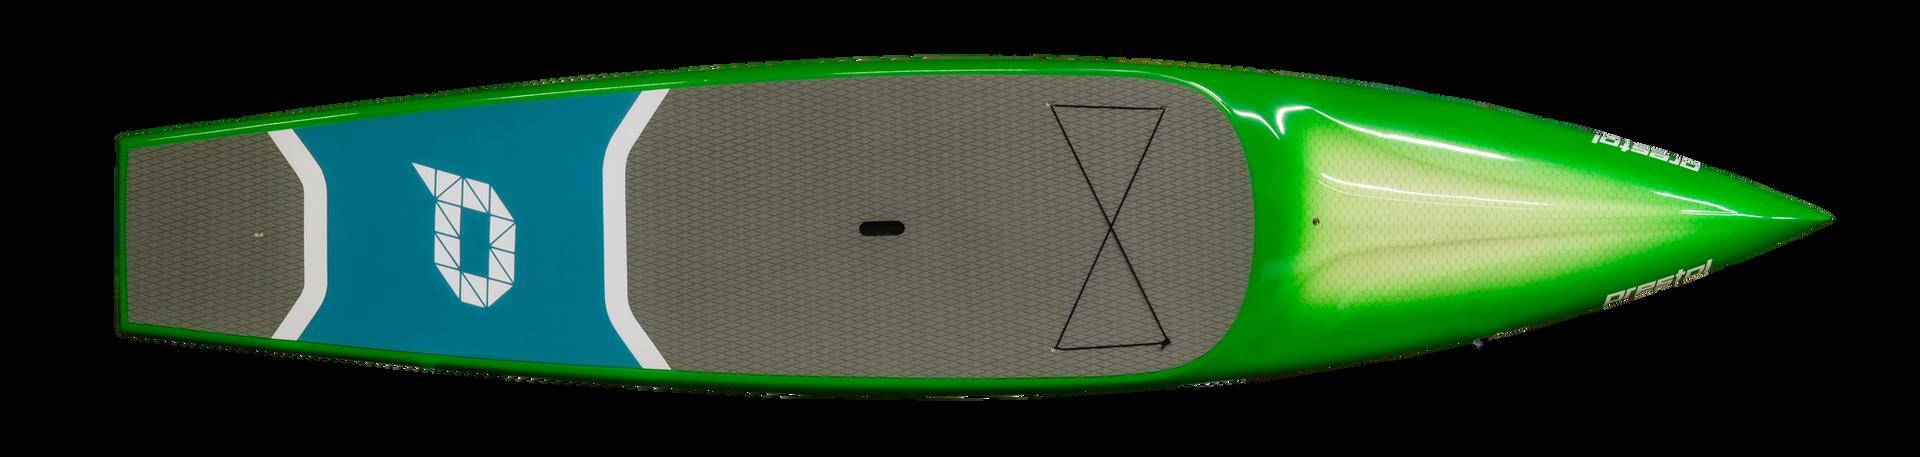 Adventure Sport 12.6 Prestol SUP board